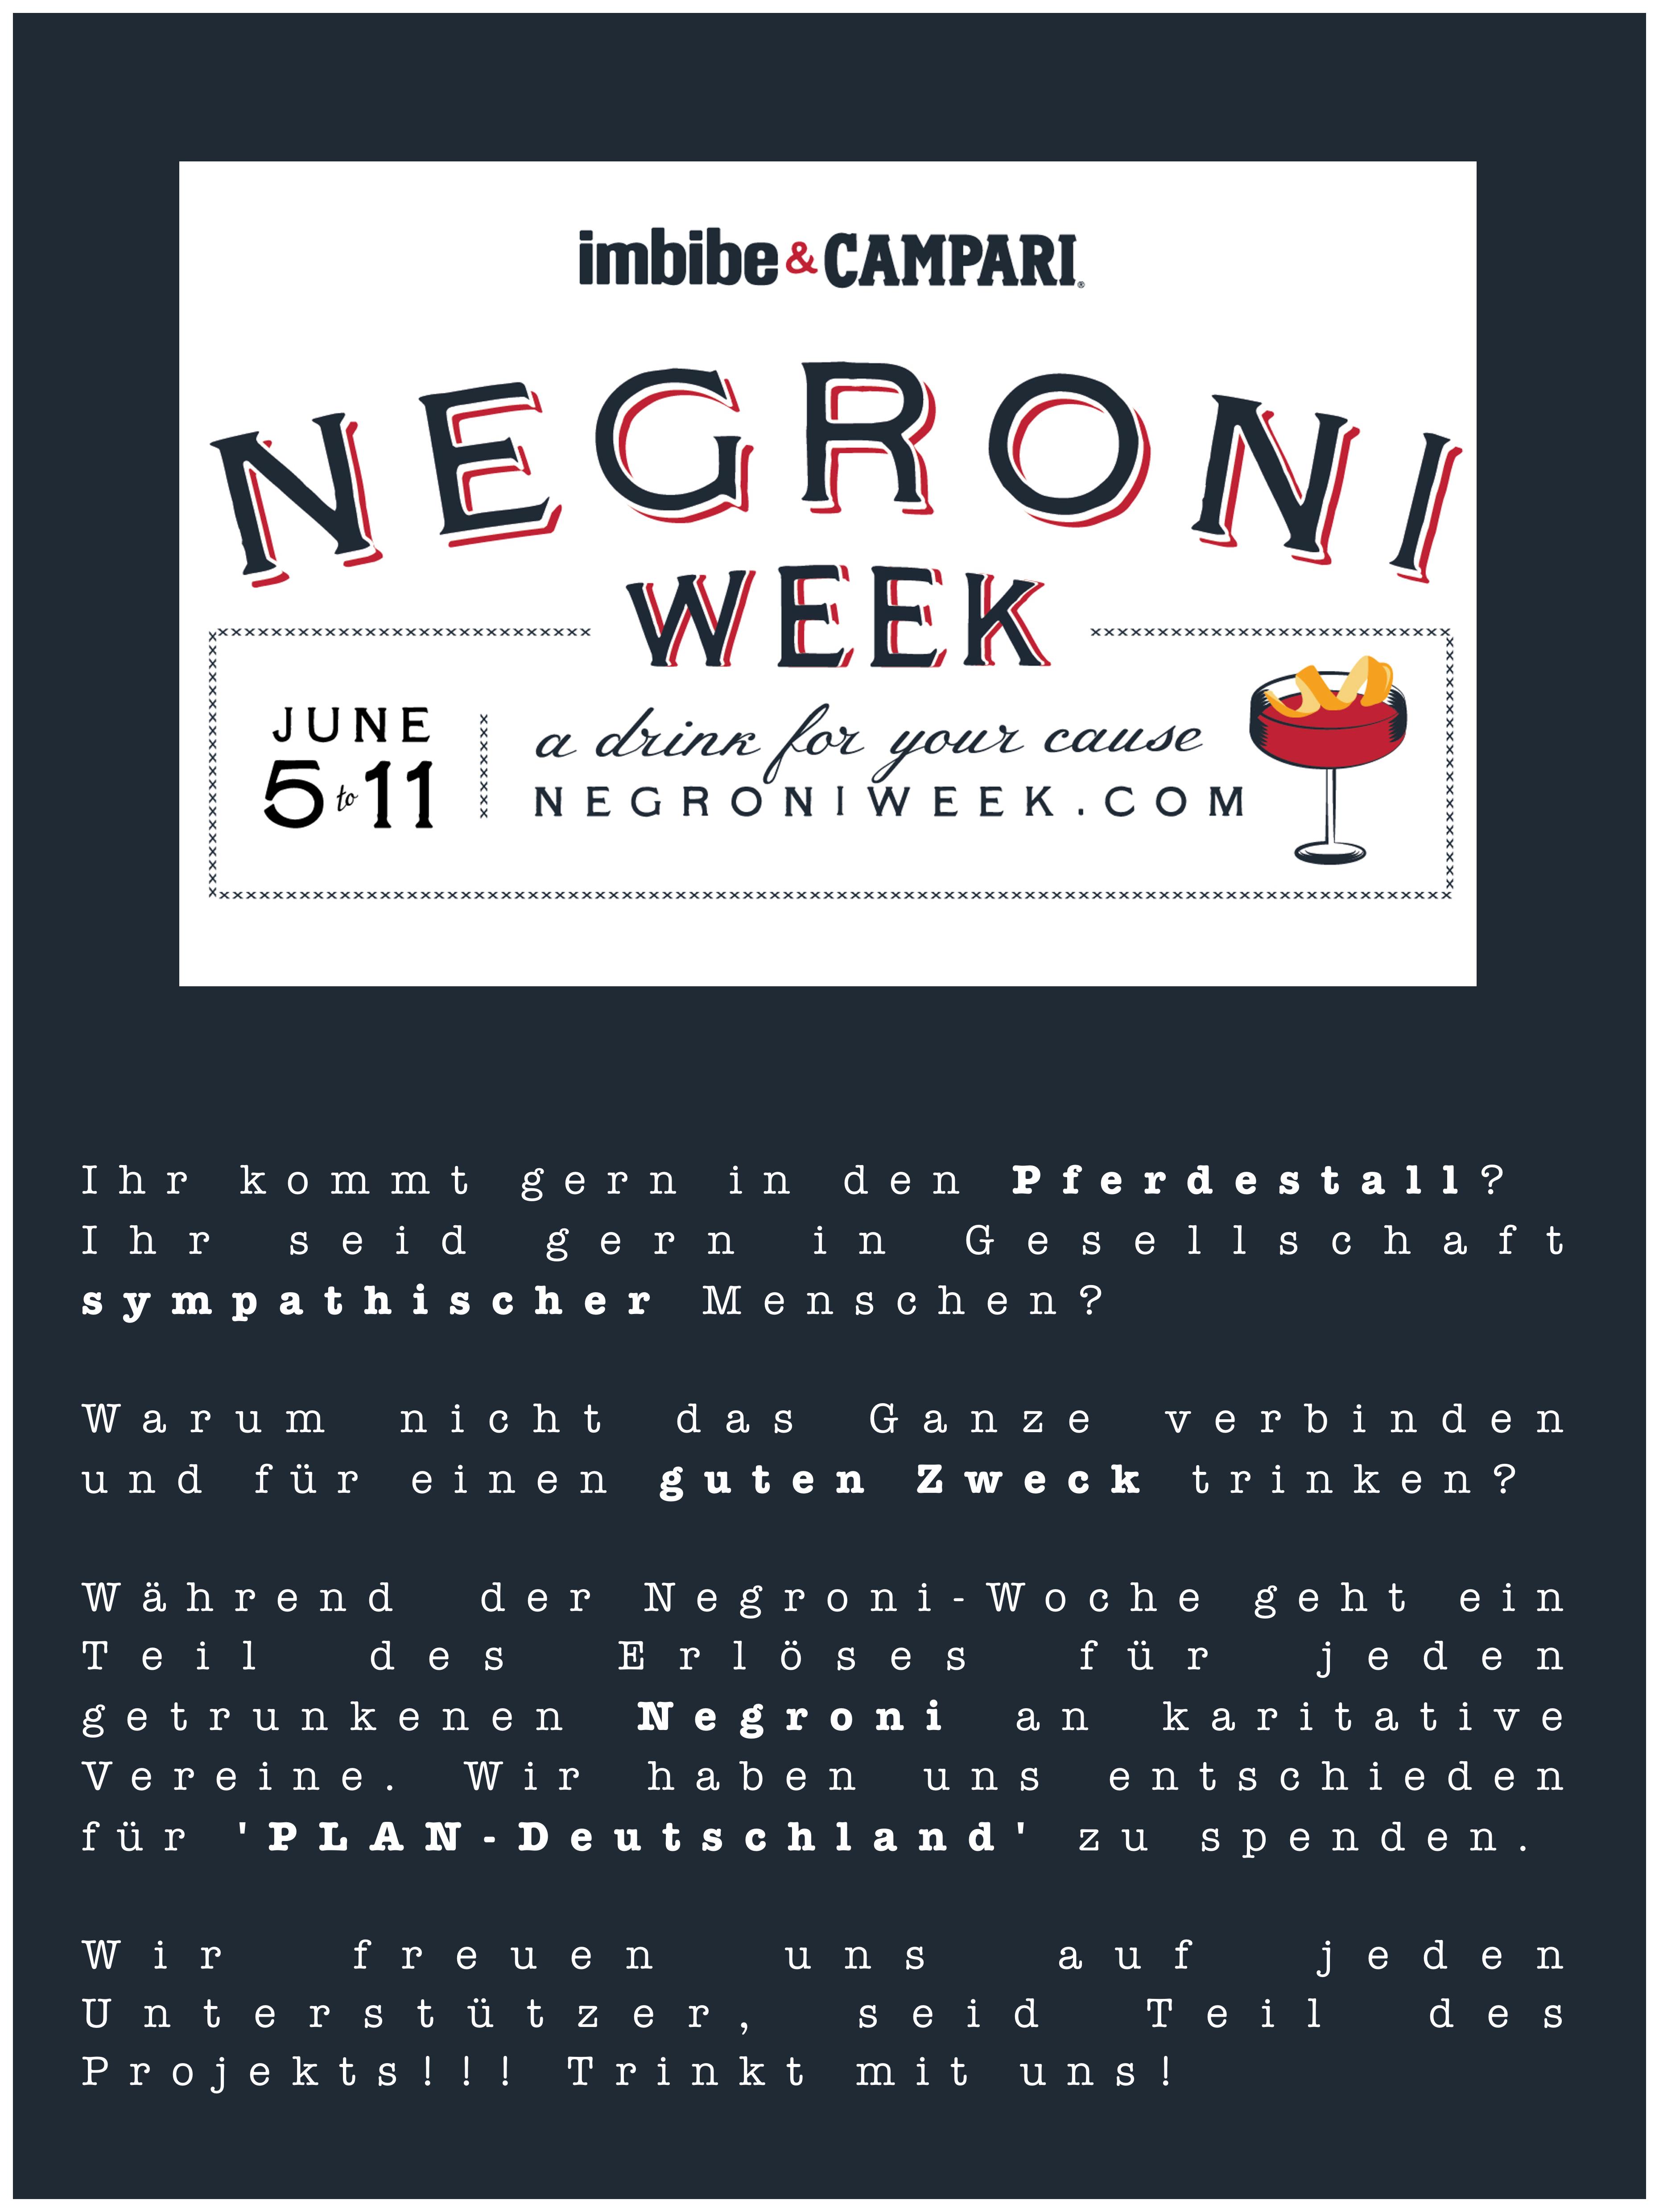 negroniweek2017